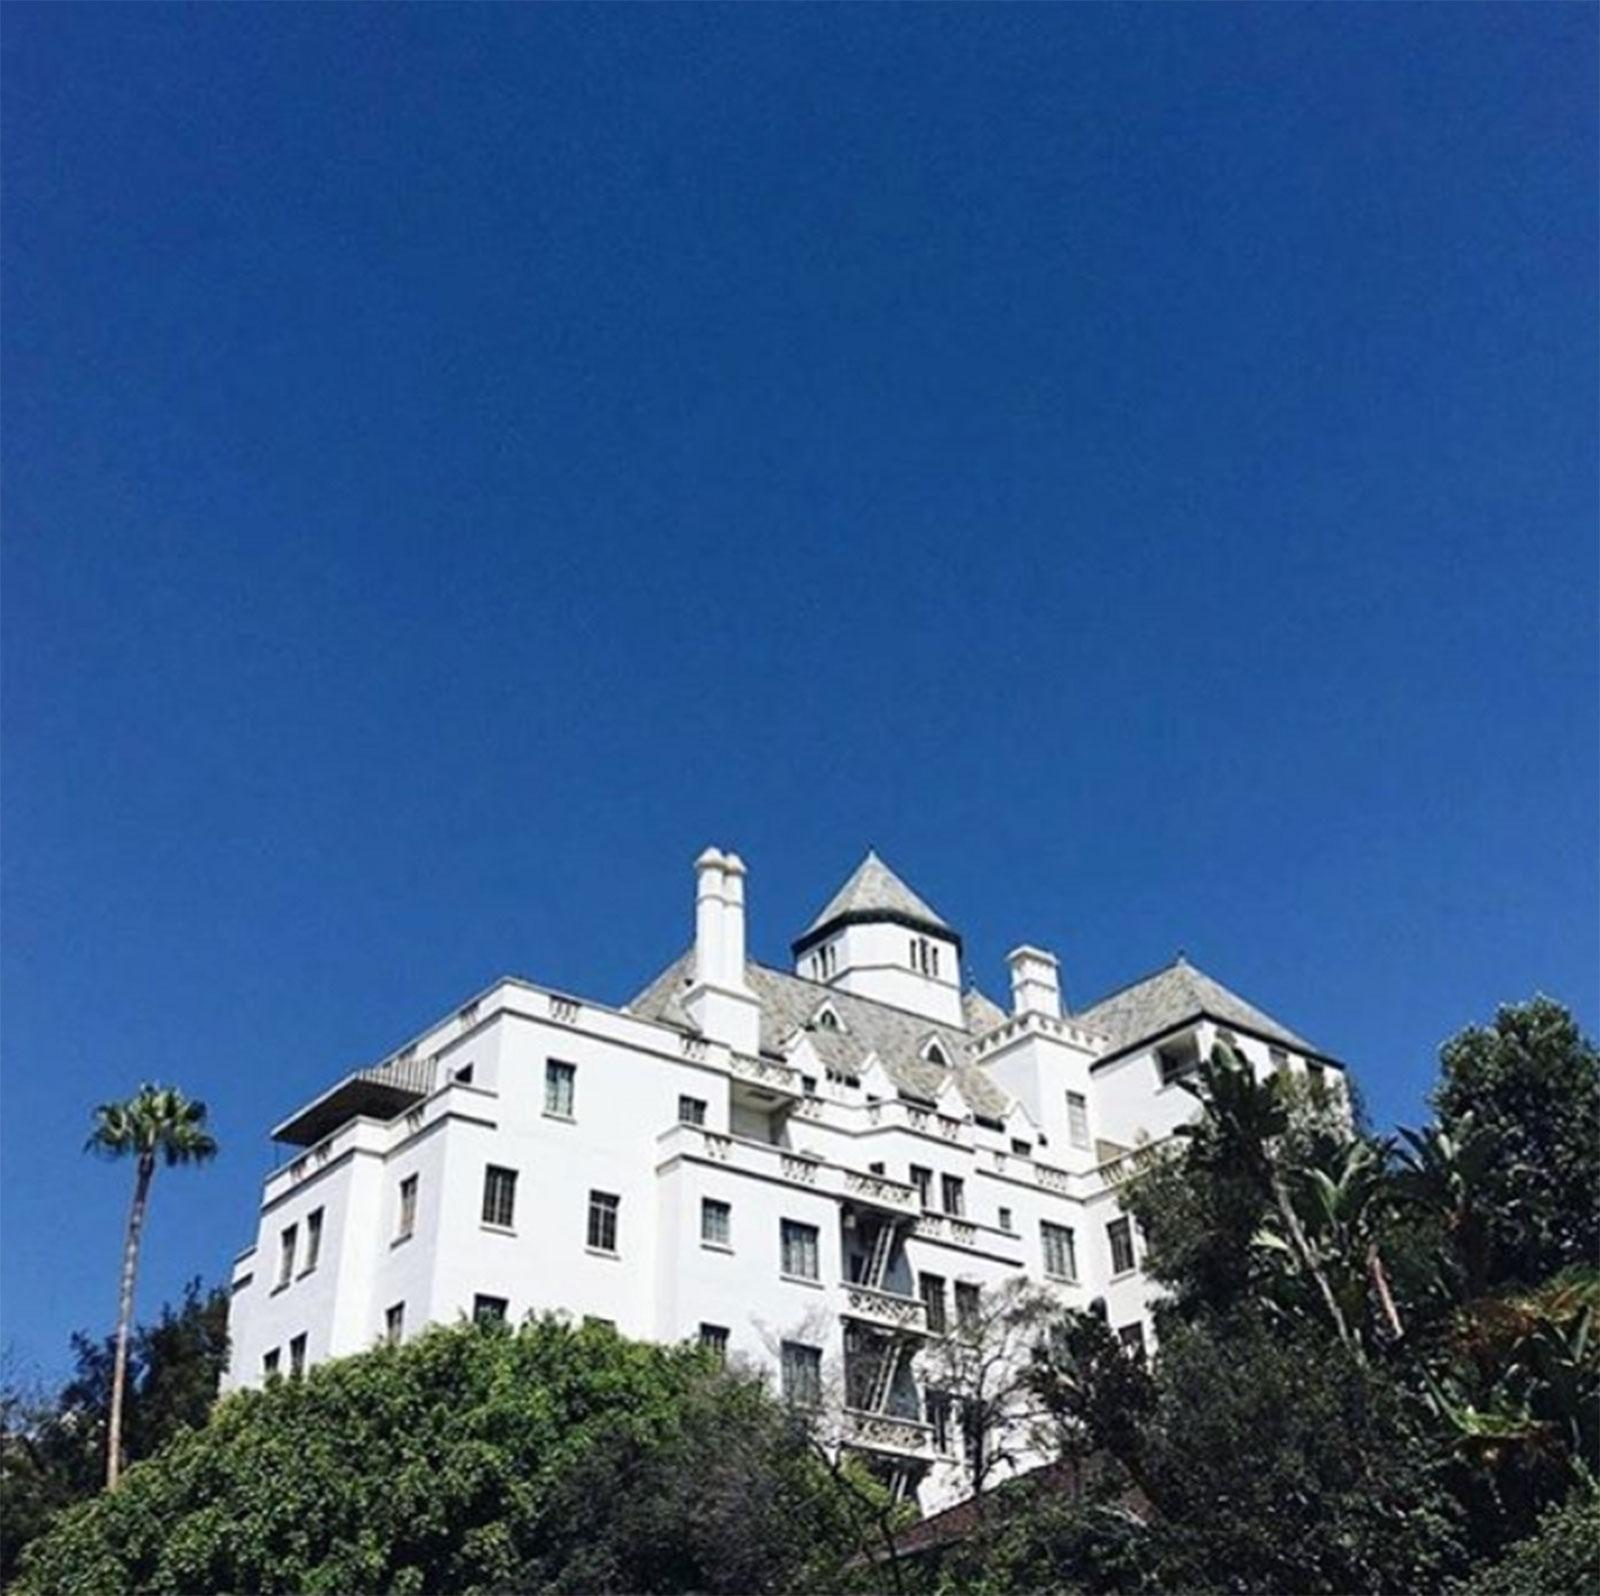 Chateau_Marmont_The_Ink_Collective_Pret-a-Partir_Los_Angeles_2.jpg